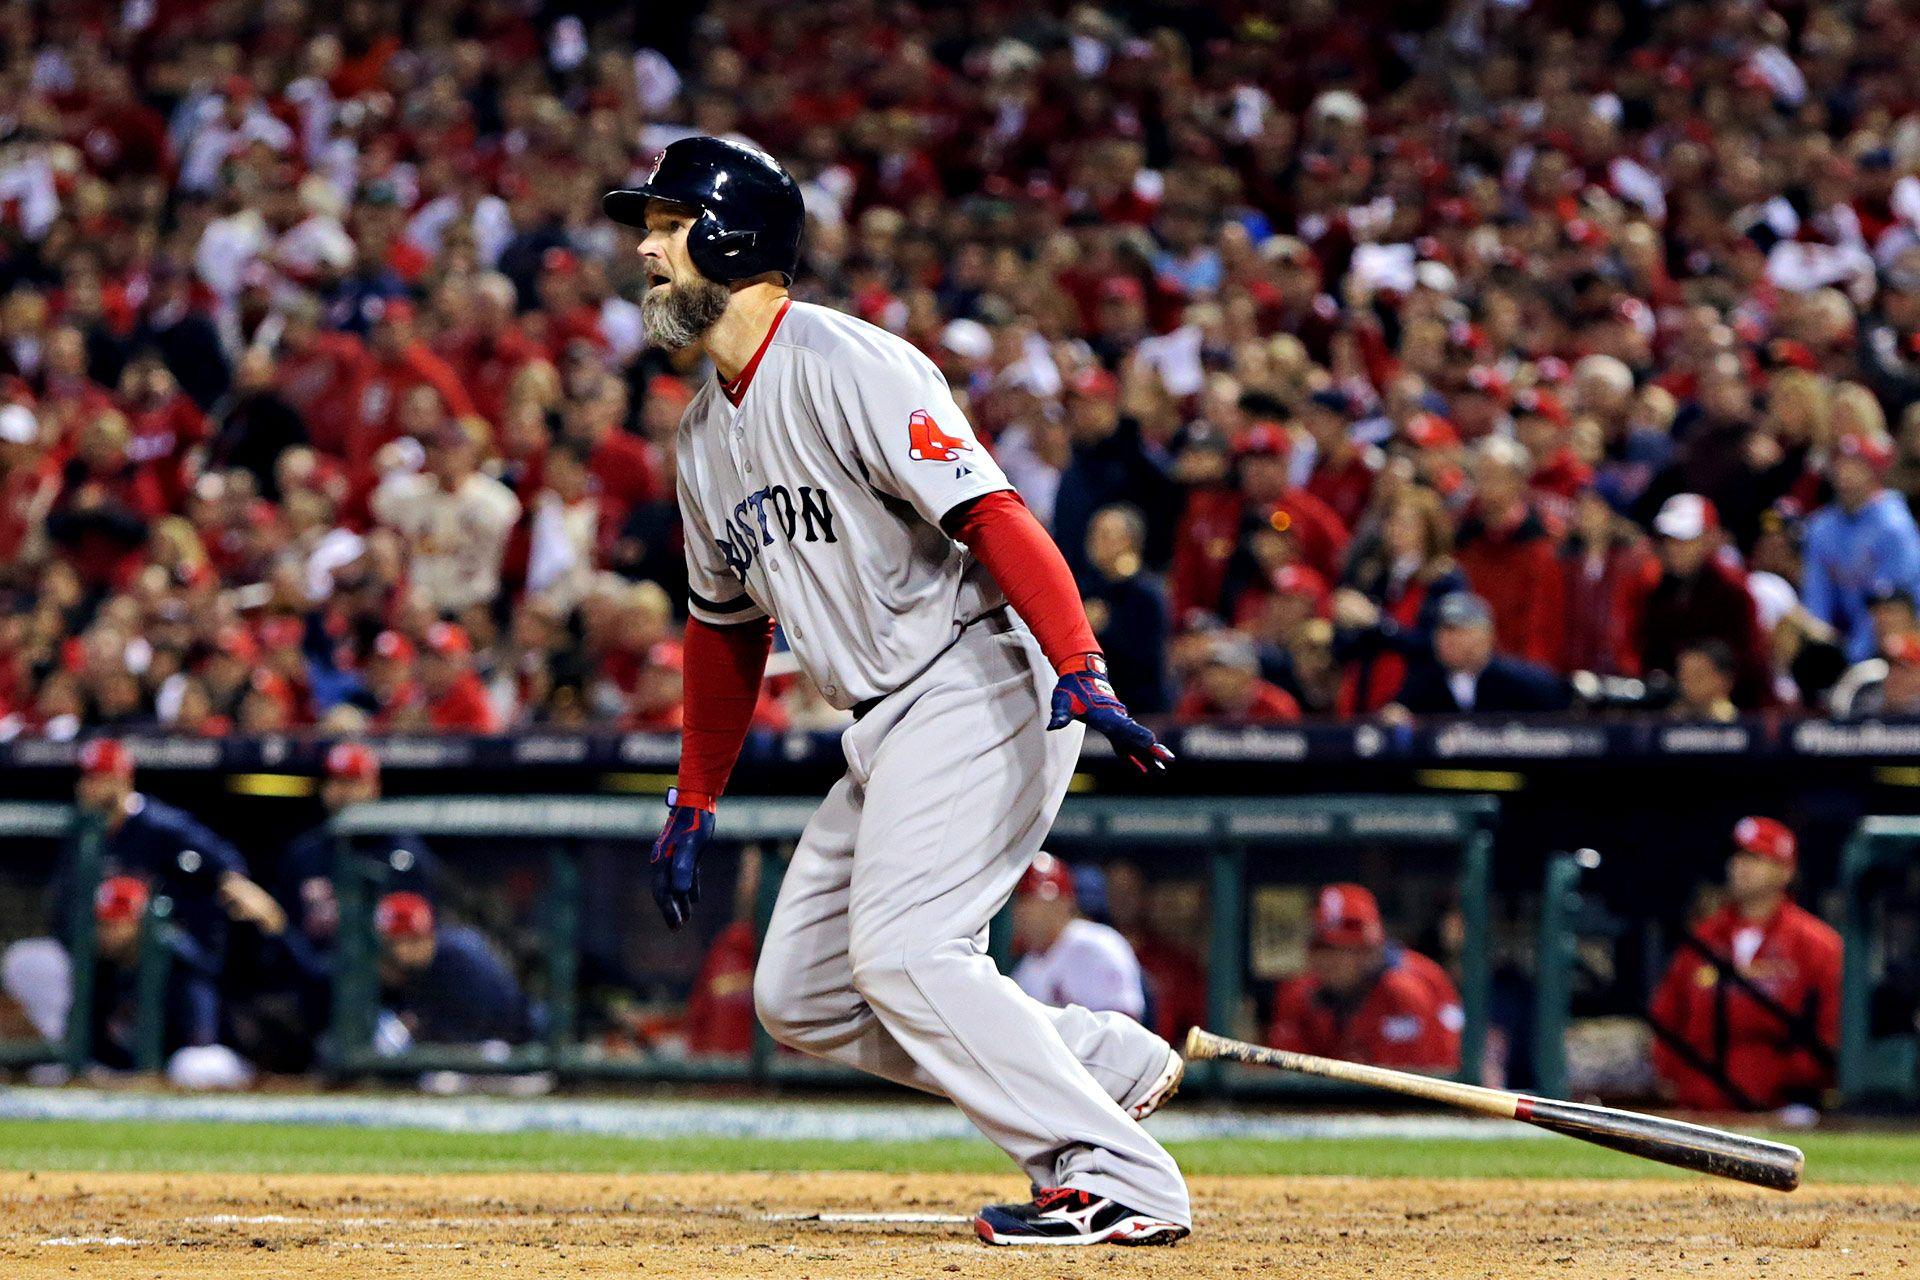 Ставки на спорт, прогнозы на MLB бейсбол, ставки на MLB бейсбол